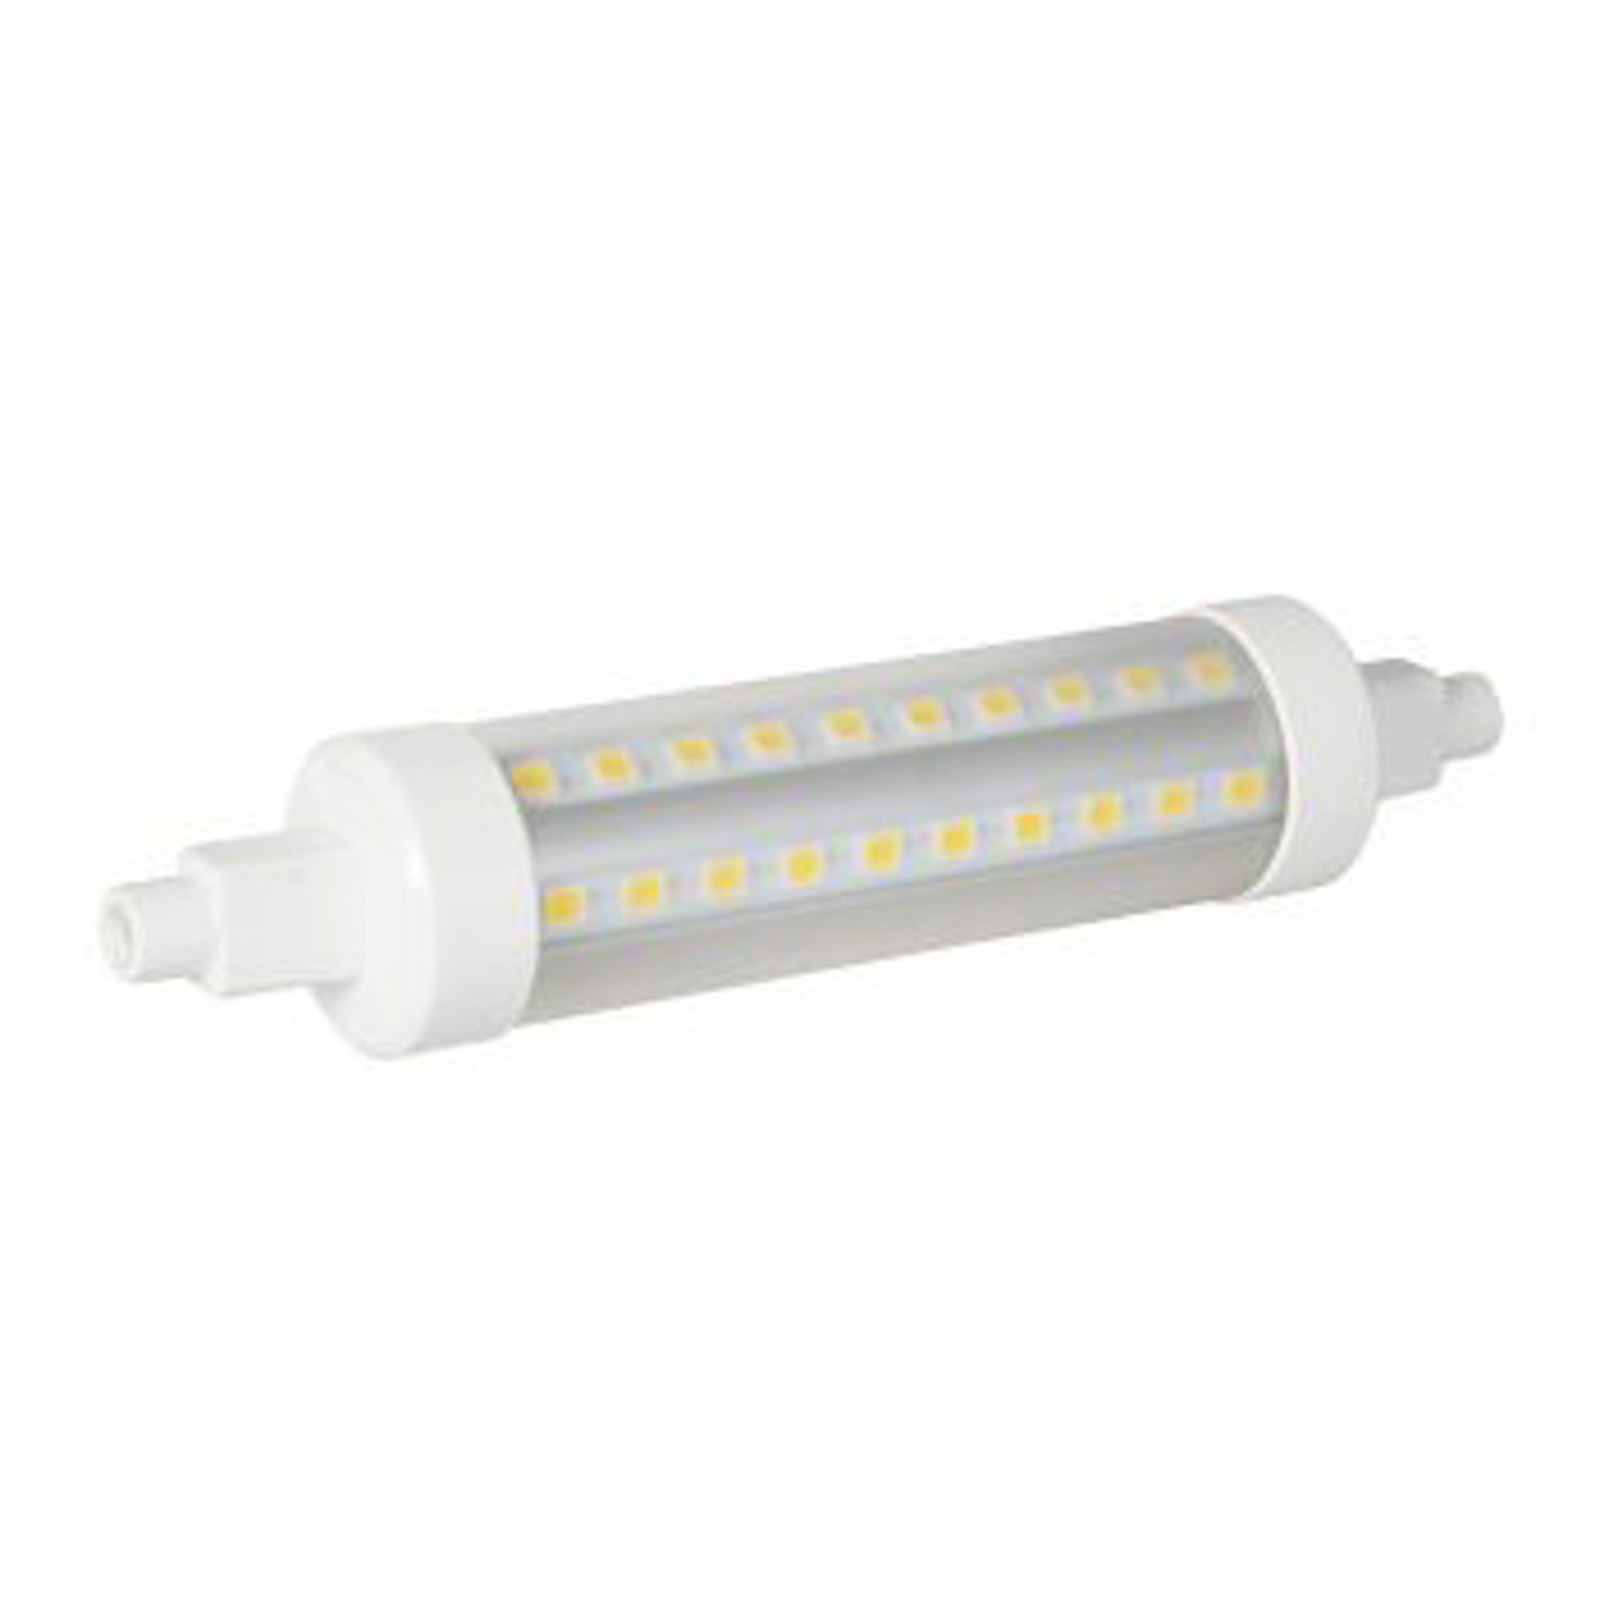 Bombilla LED R7s 8W 827 VEO con forma de barra